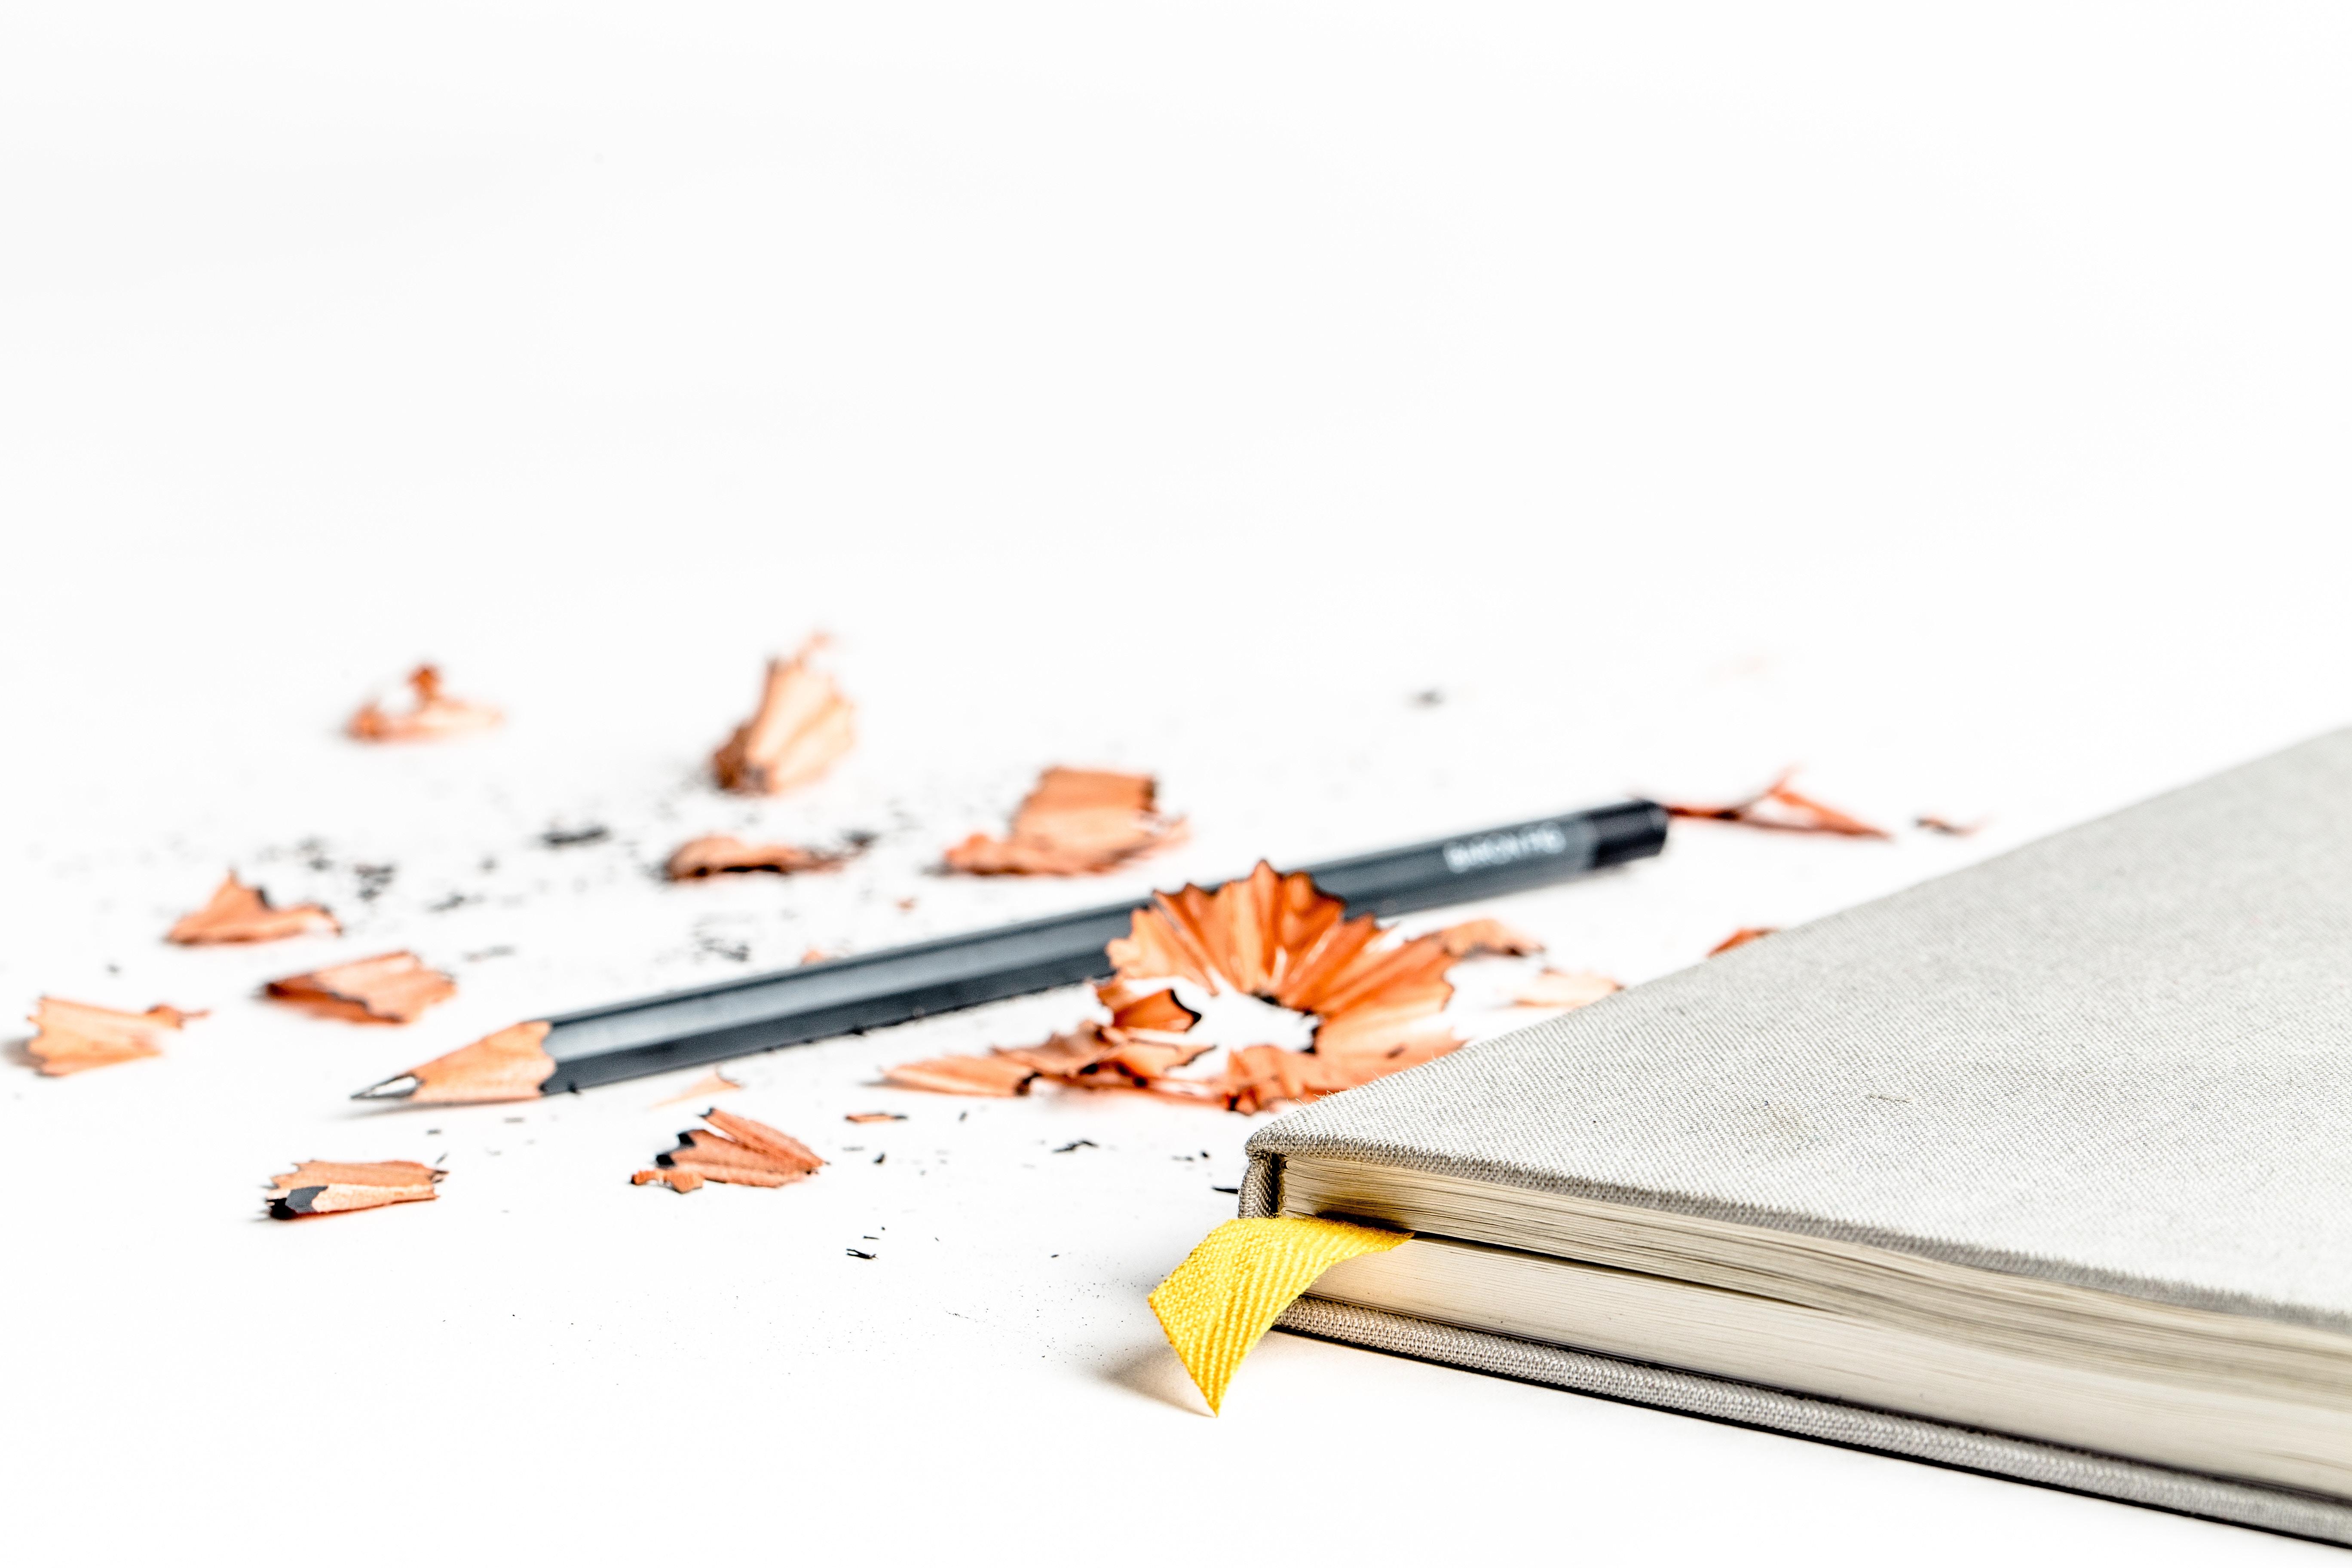 Sharpen-those-pencils